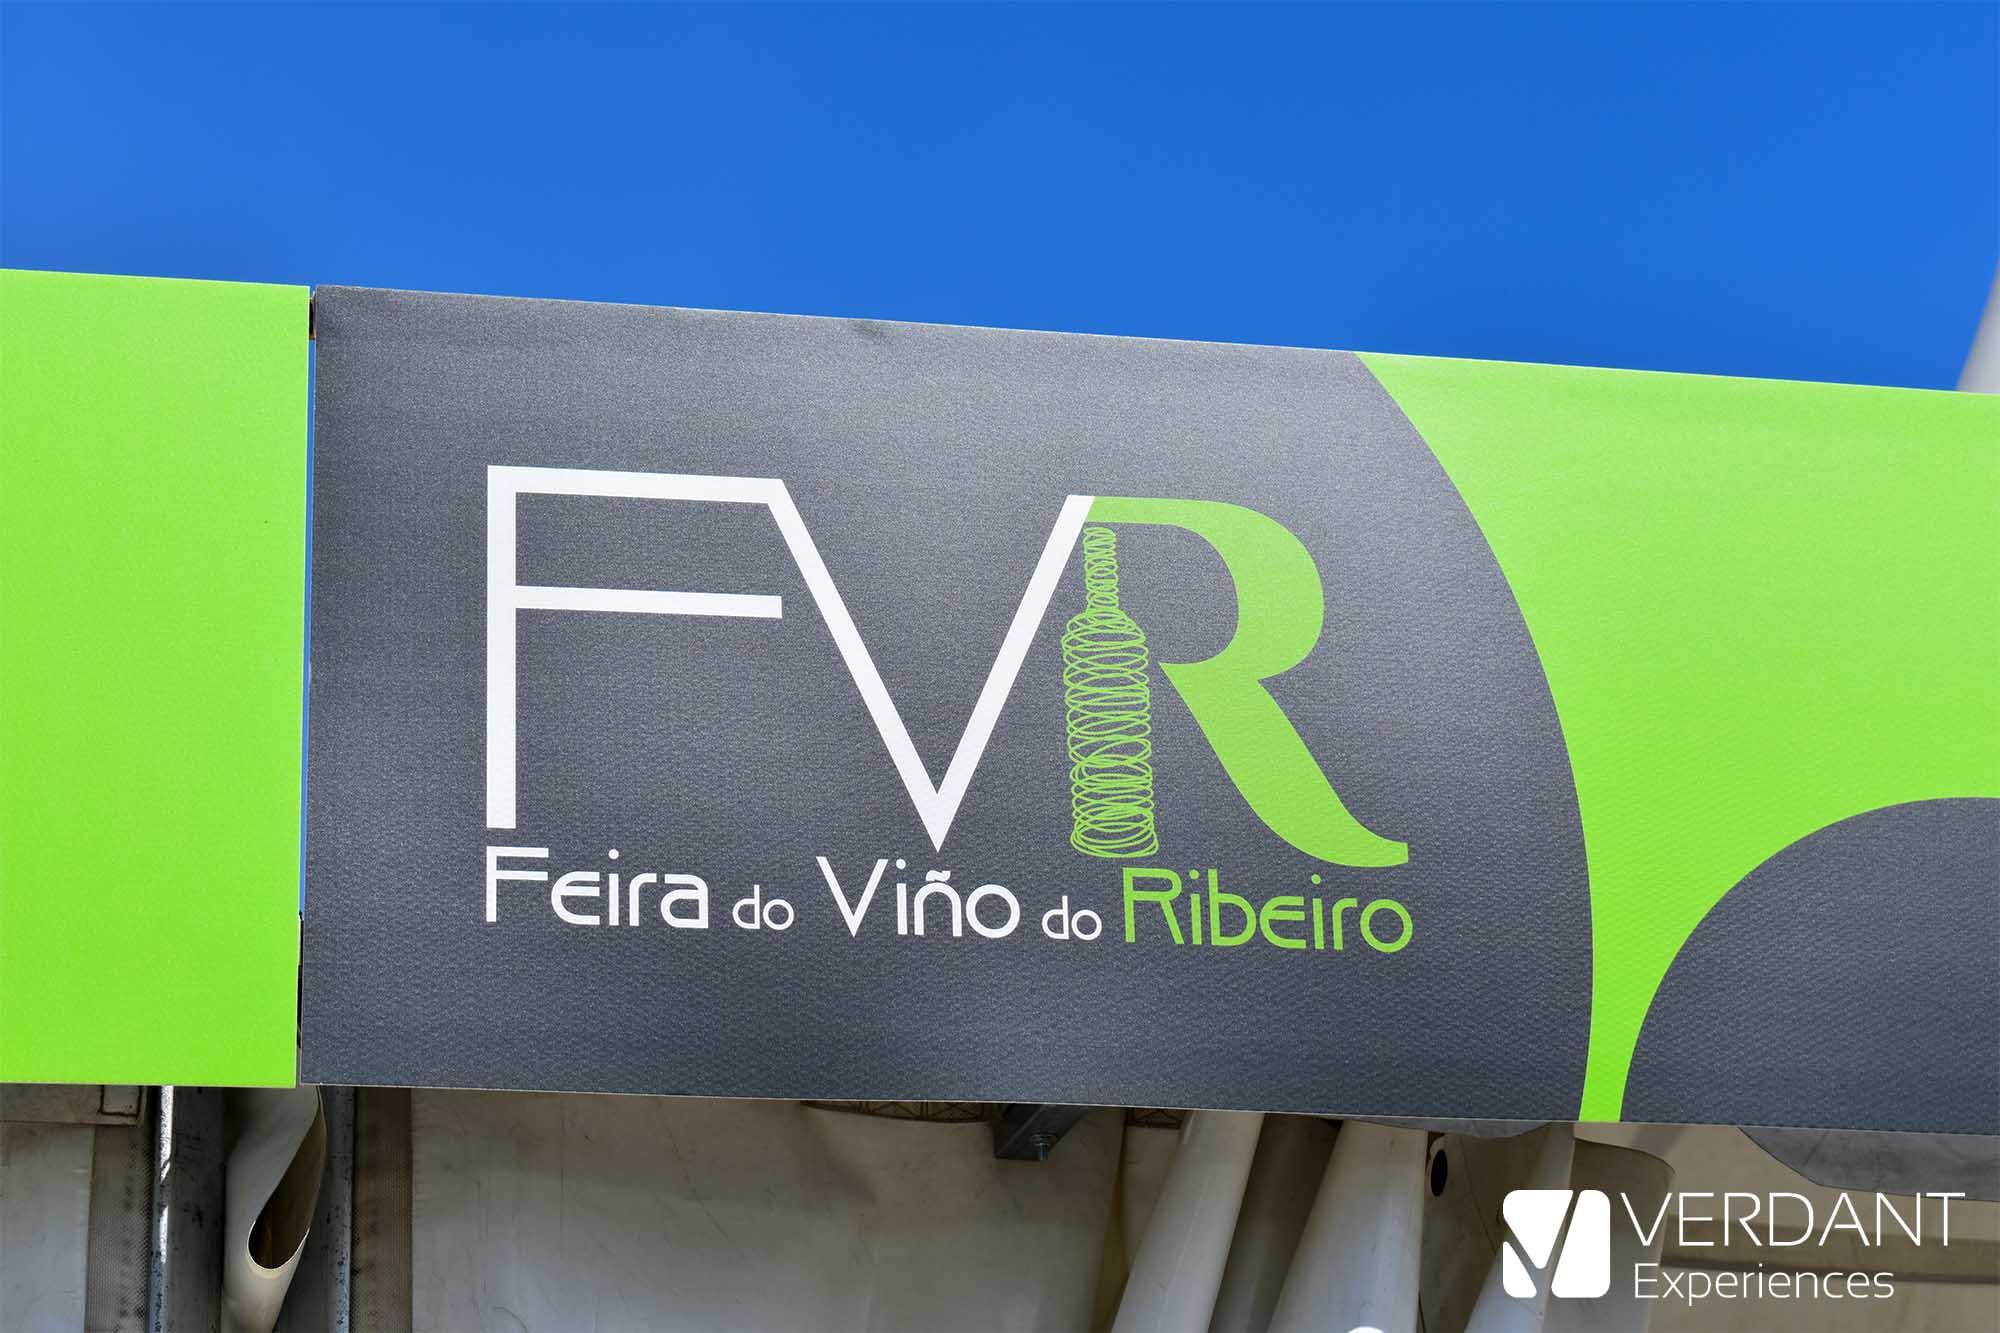 Ribeiro Wine Fair 2018 (Feria del Vino del Ribeiro 2018)